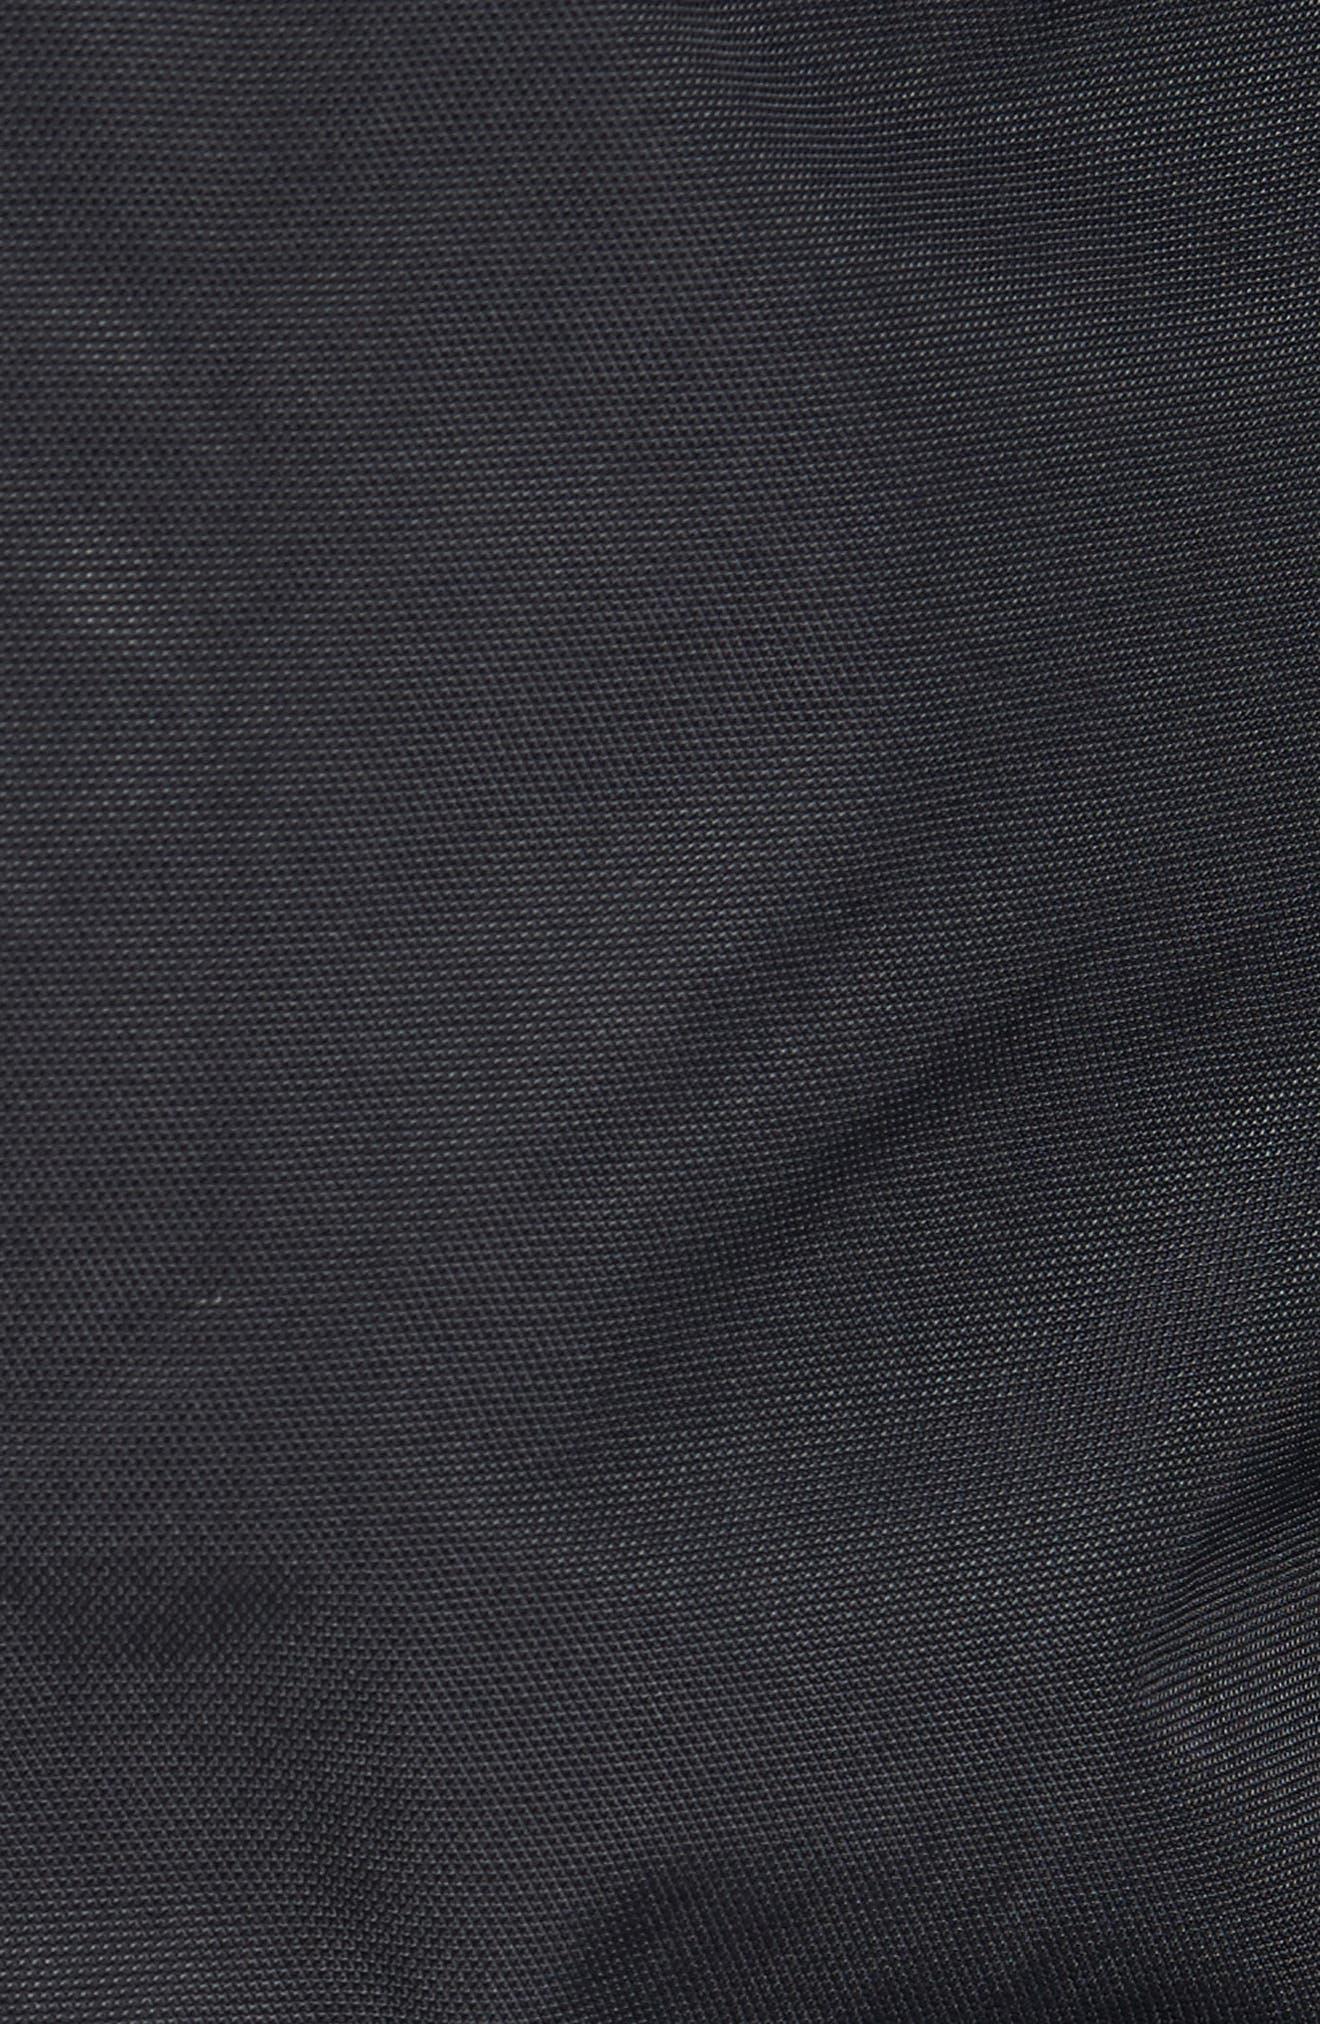 El Misti Trench II Hooded Jacket,                             Alternate thumbnail 6, color,                             BLACK